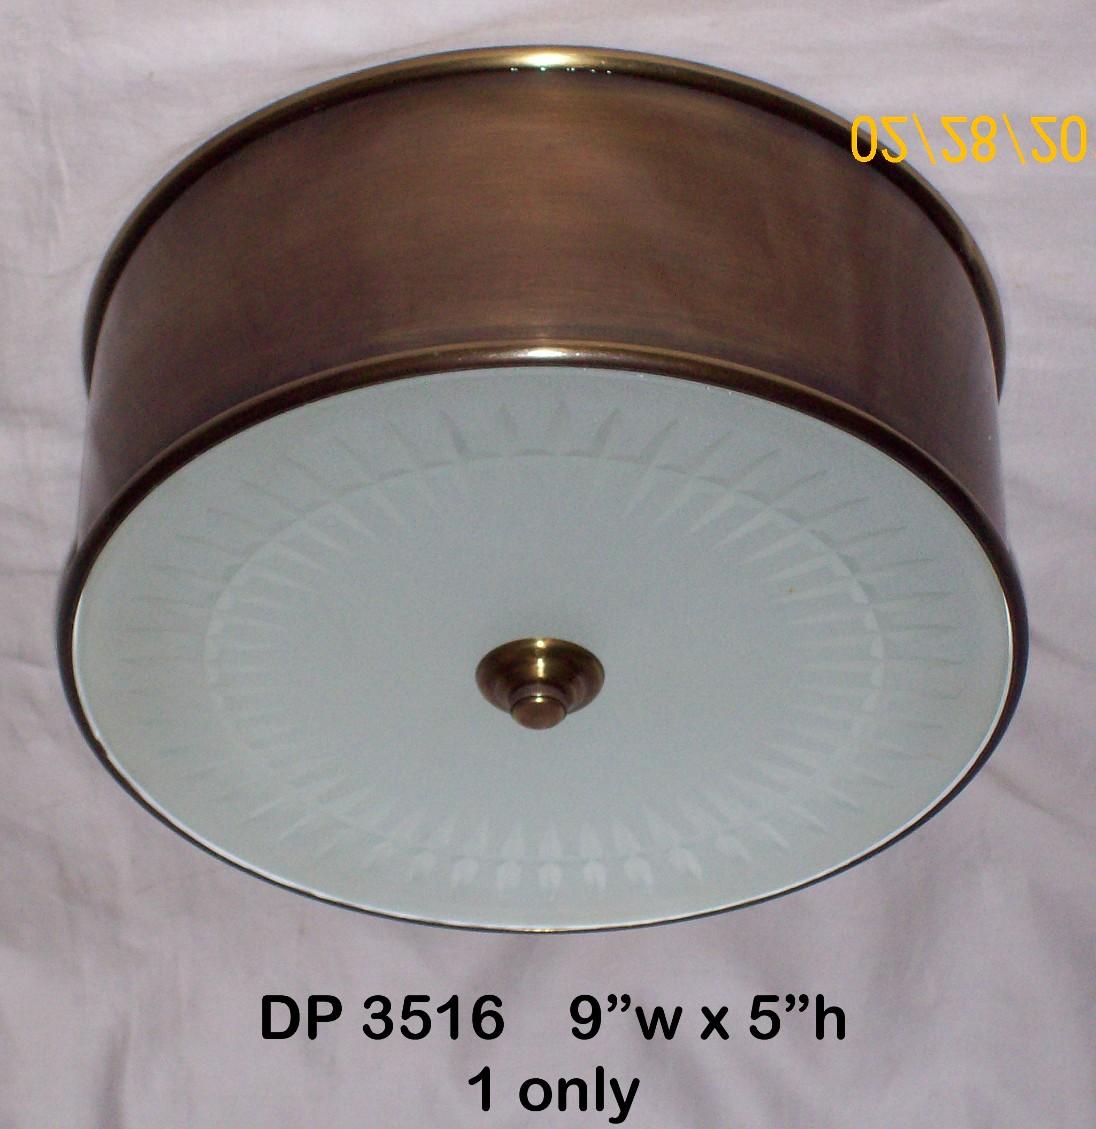 DP 3516